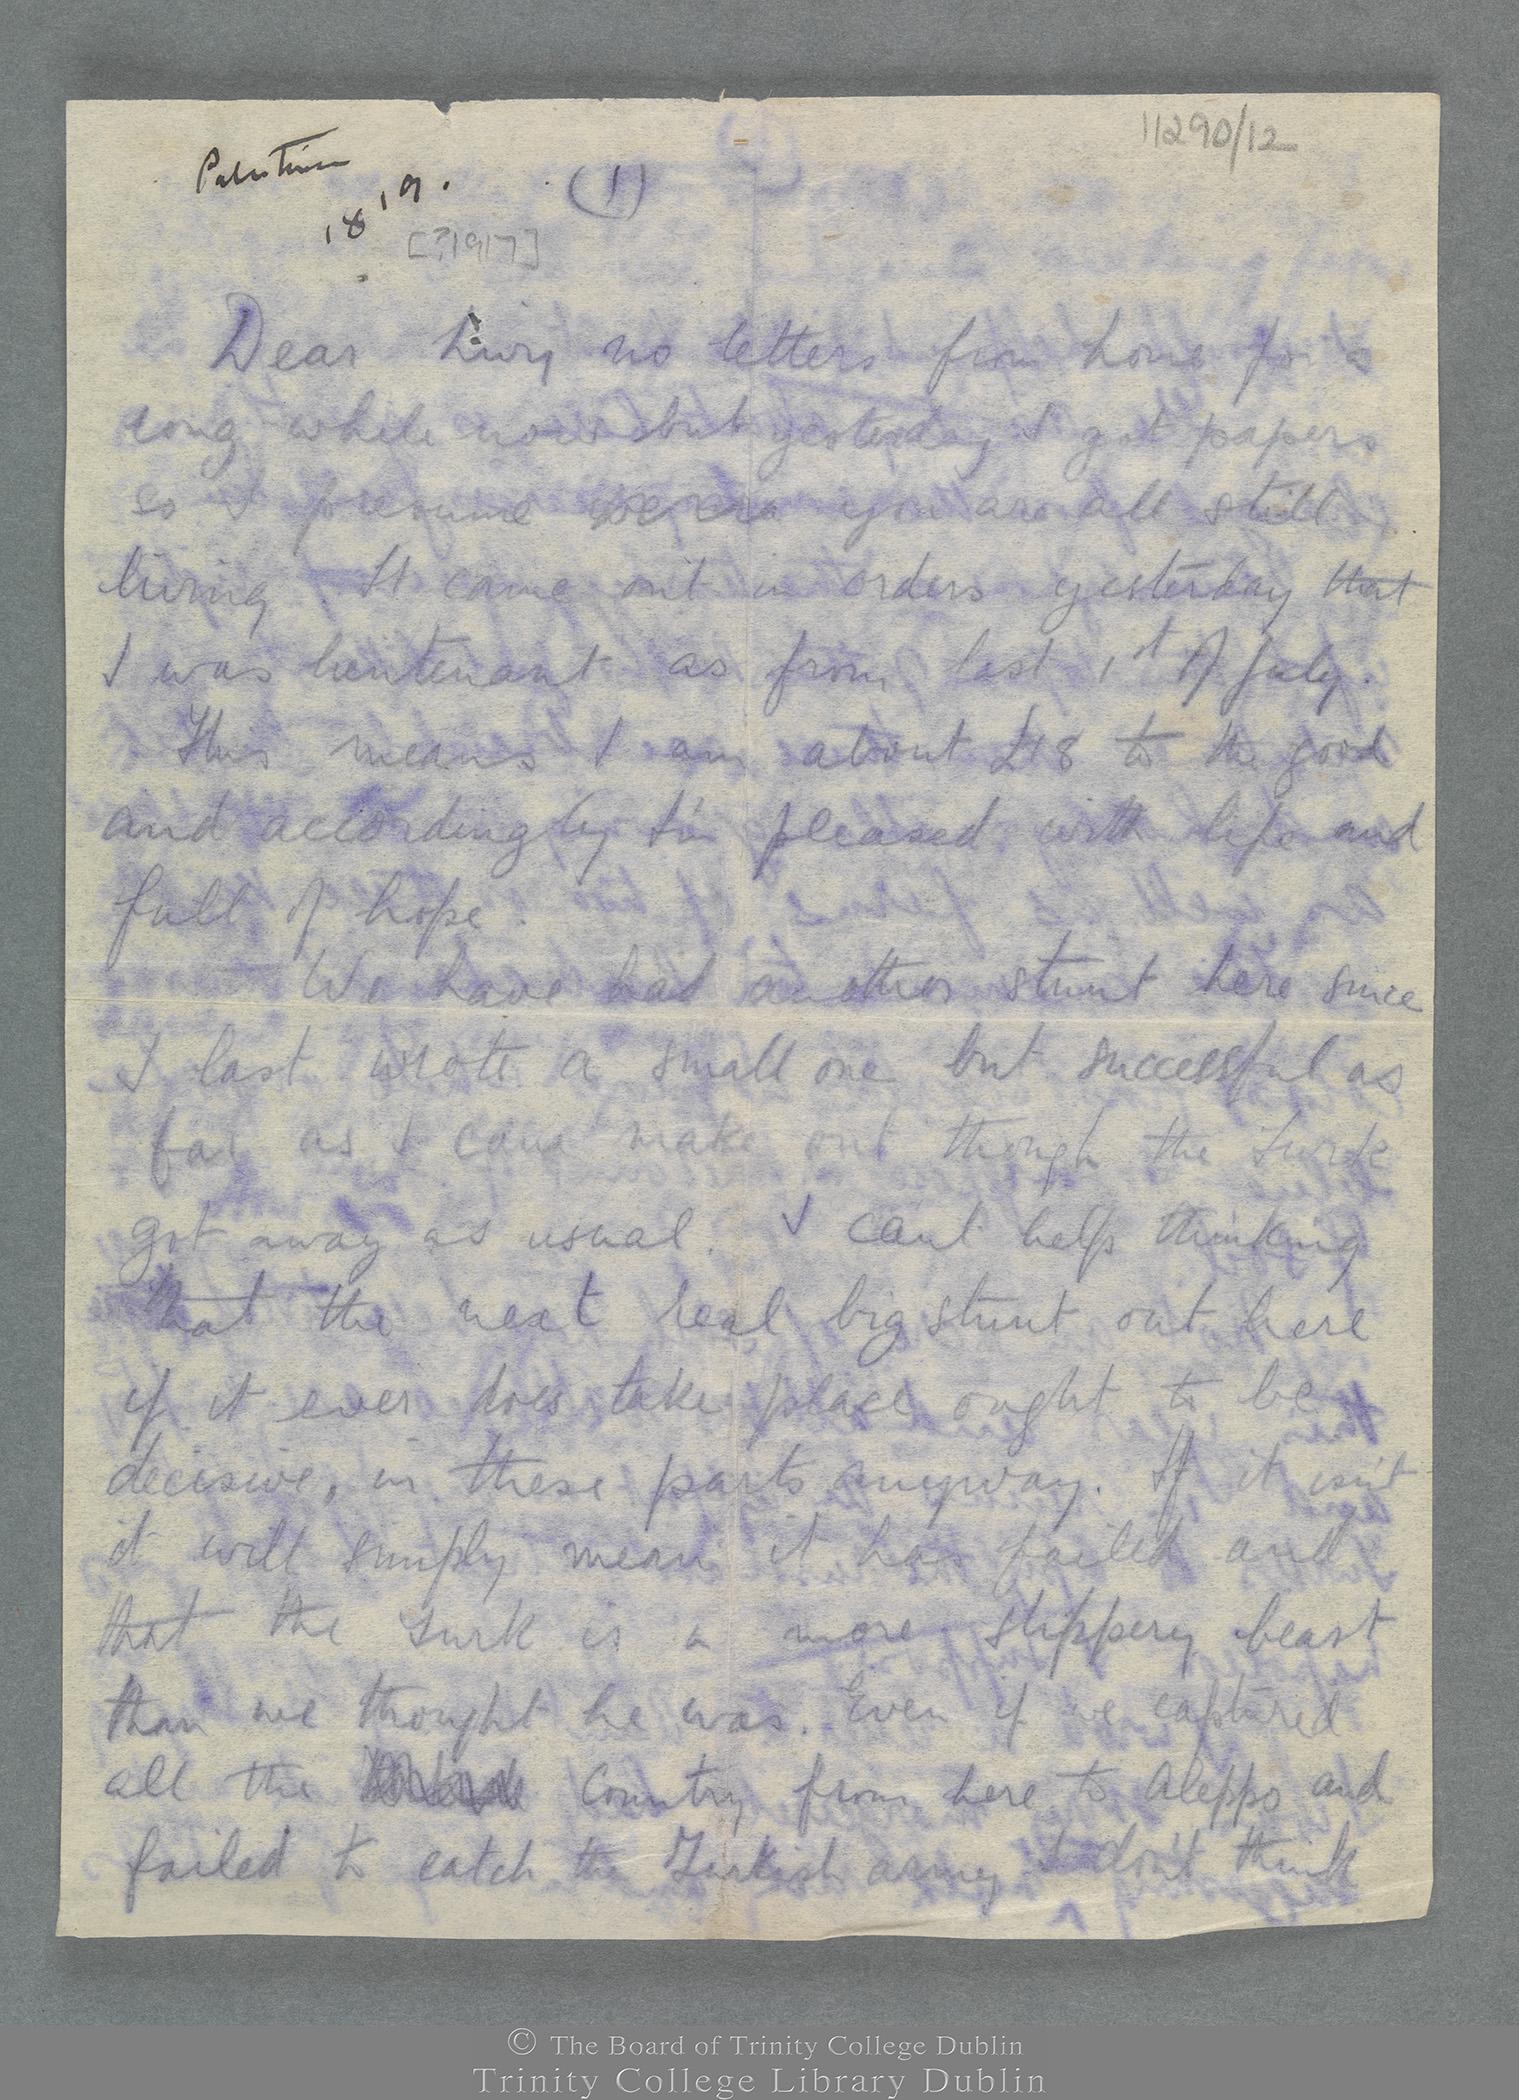 TCD MS 11290/12 folio 1 recto